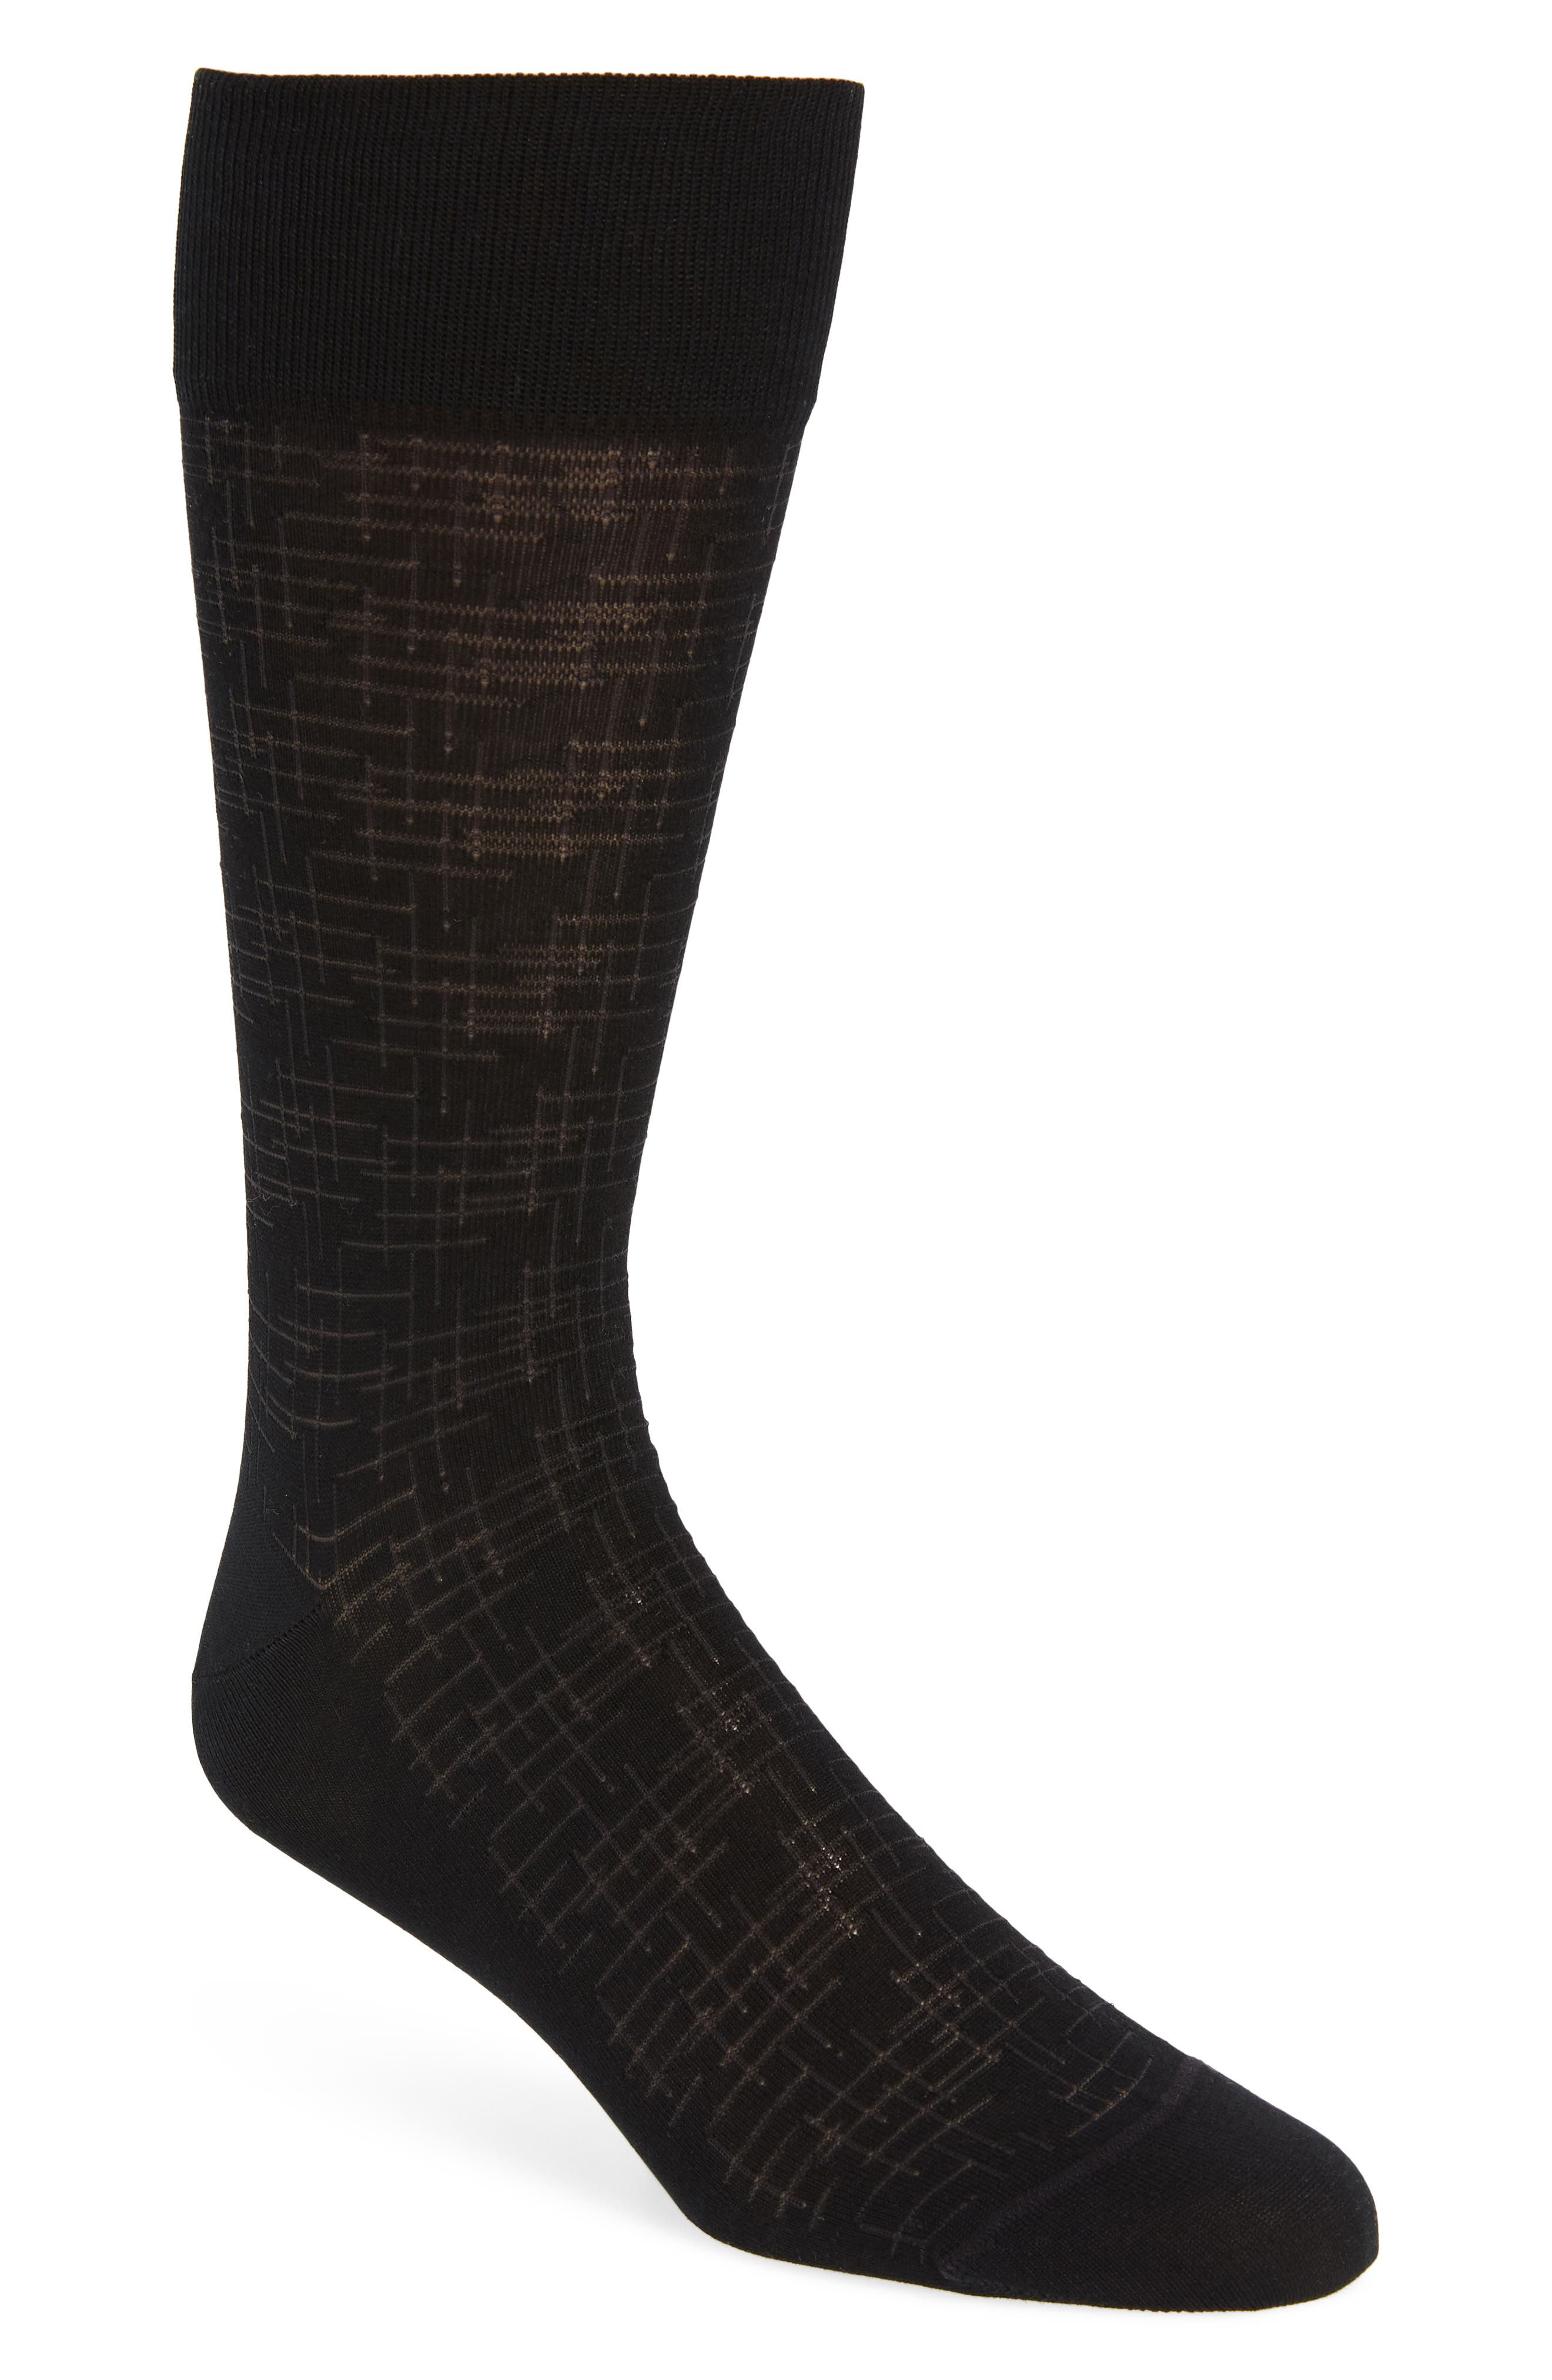 Crosshatch Socks,                             Main thumbnail 1, color,                             Black/ Charcoal